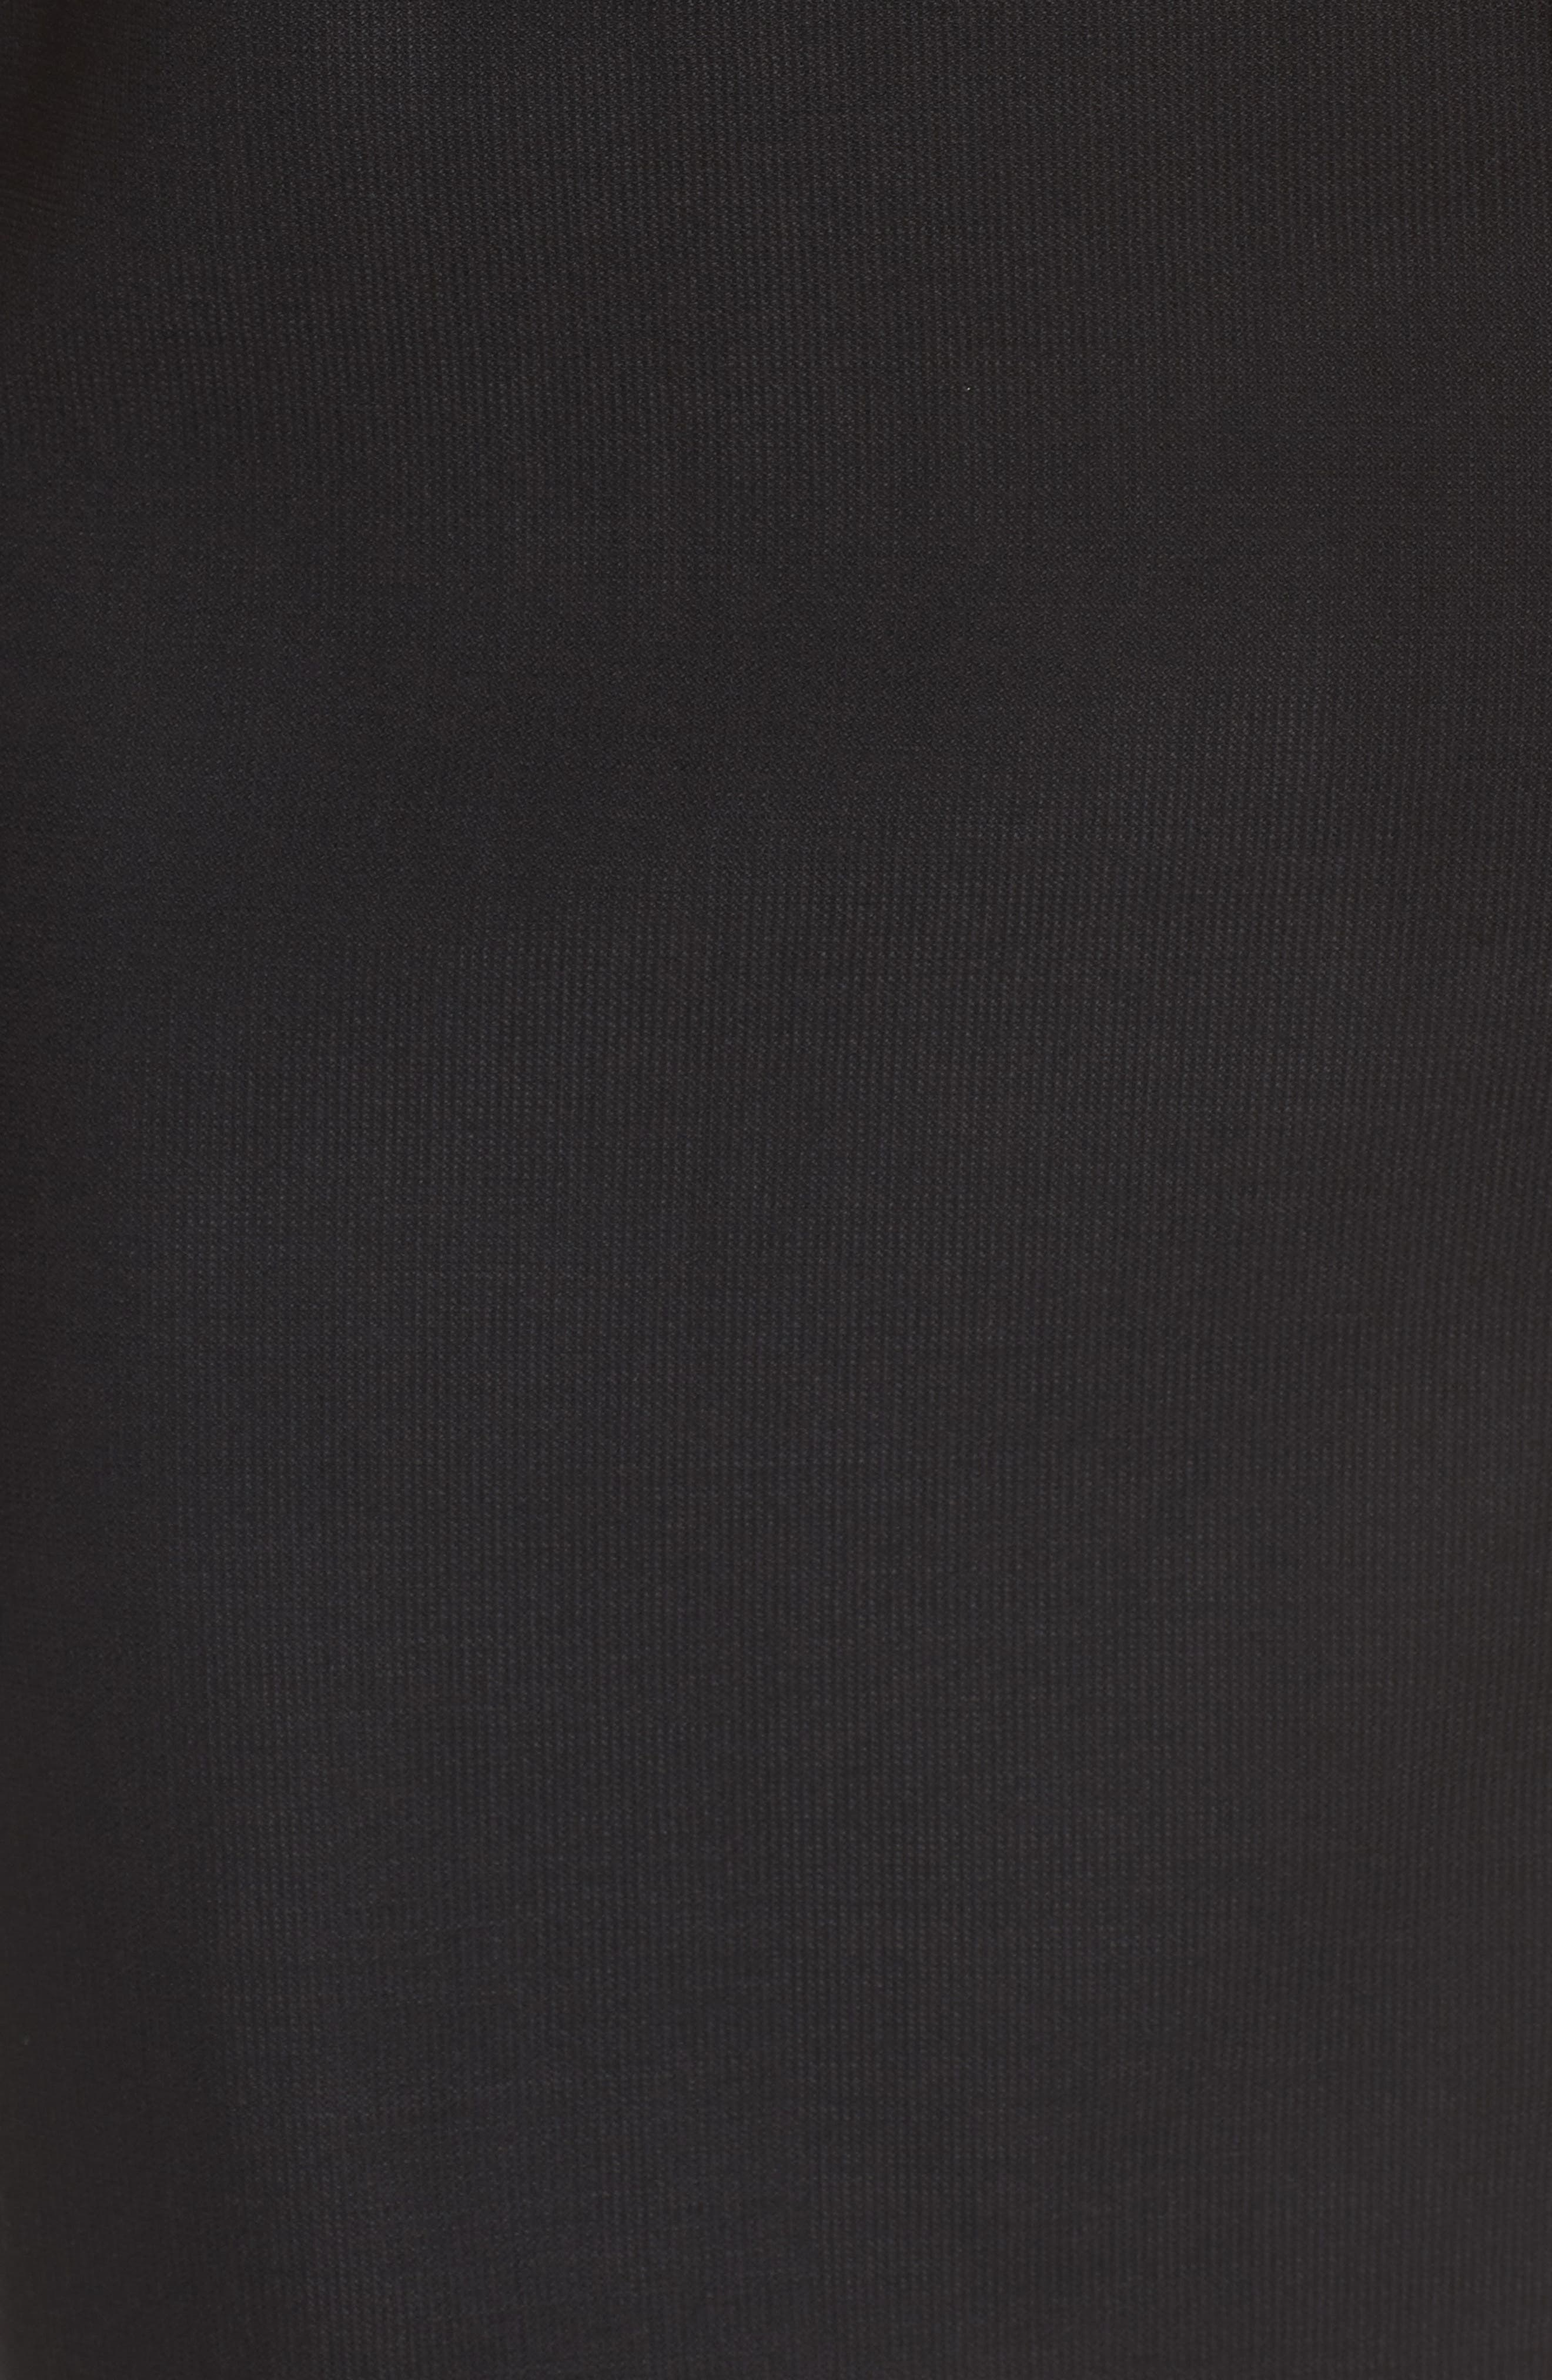 Delera Stretch Wool Sheath Dress,                             Alternate thumbnail 5, color,                             Black